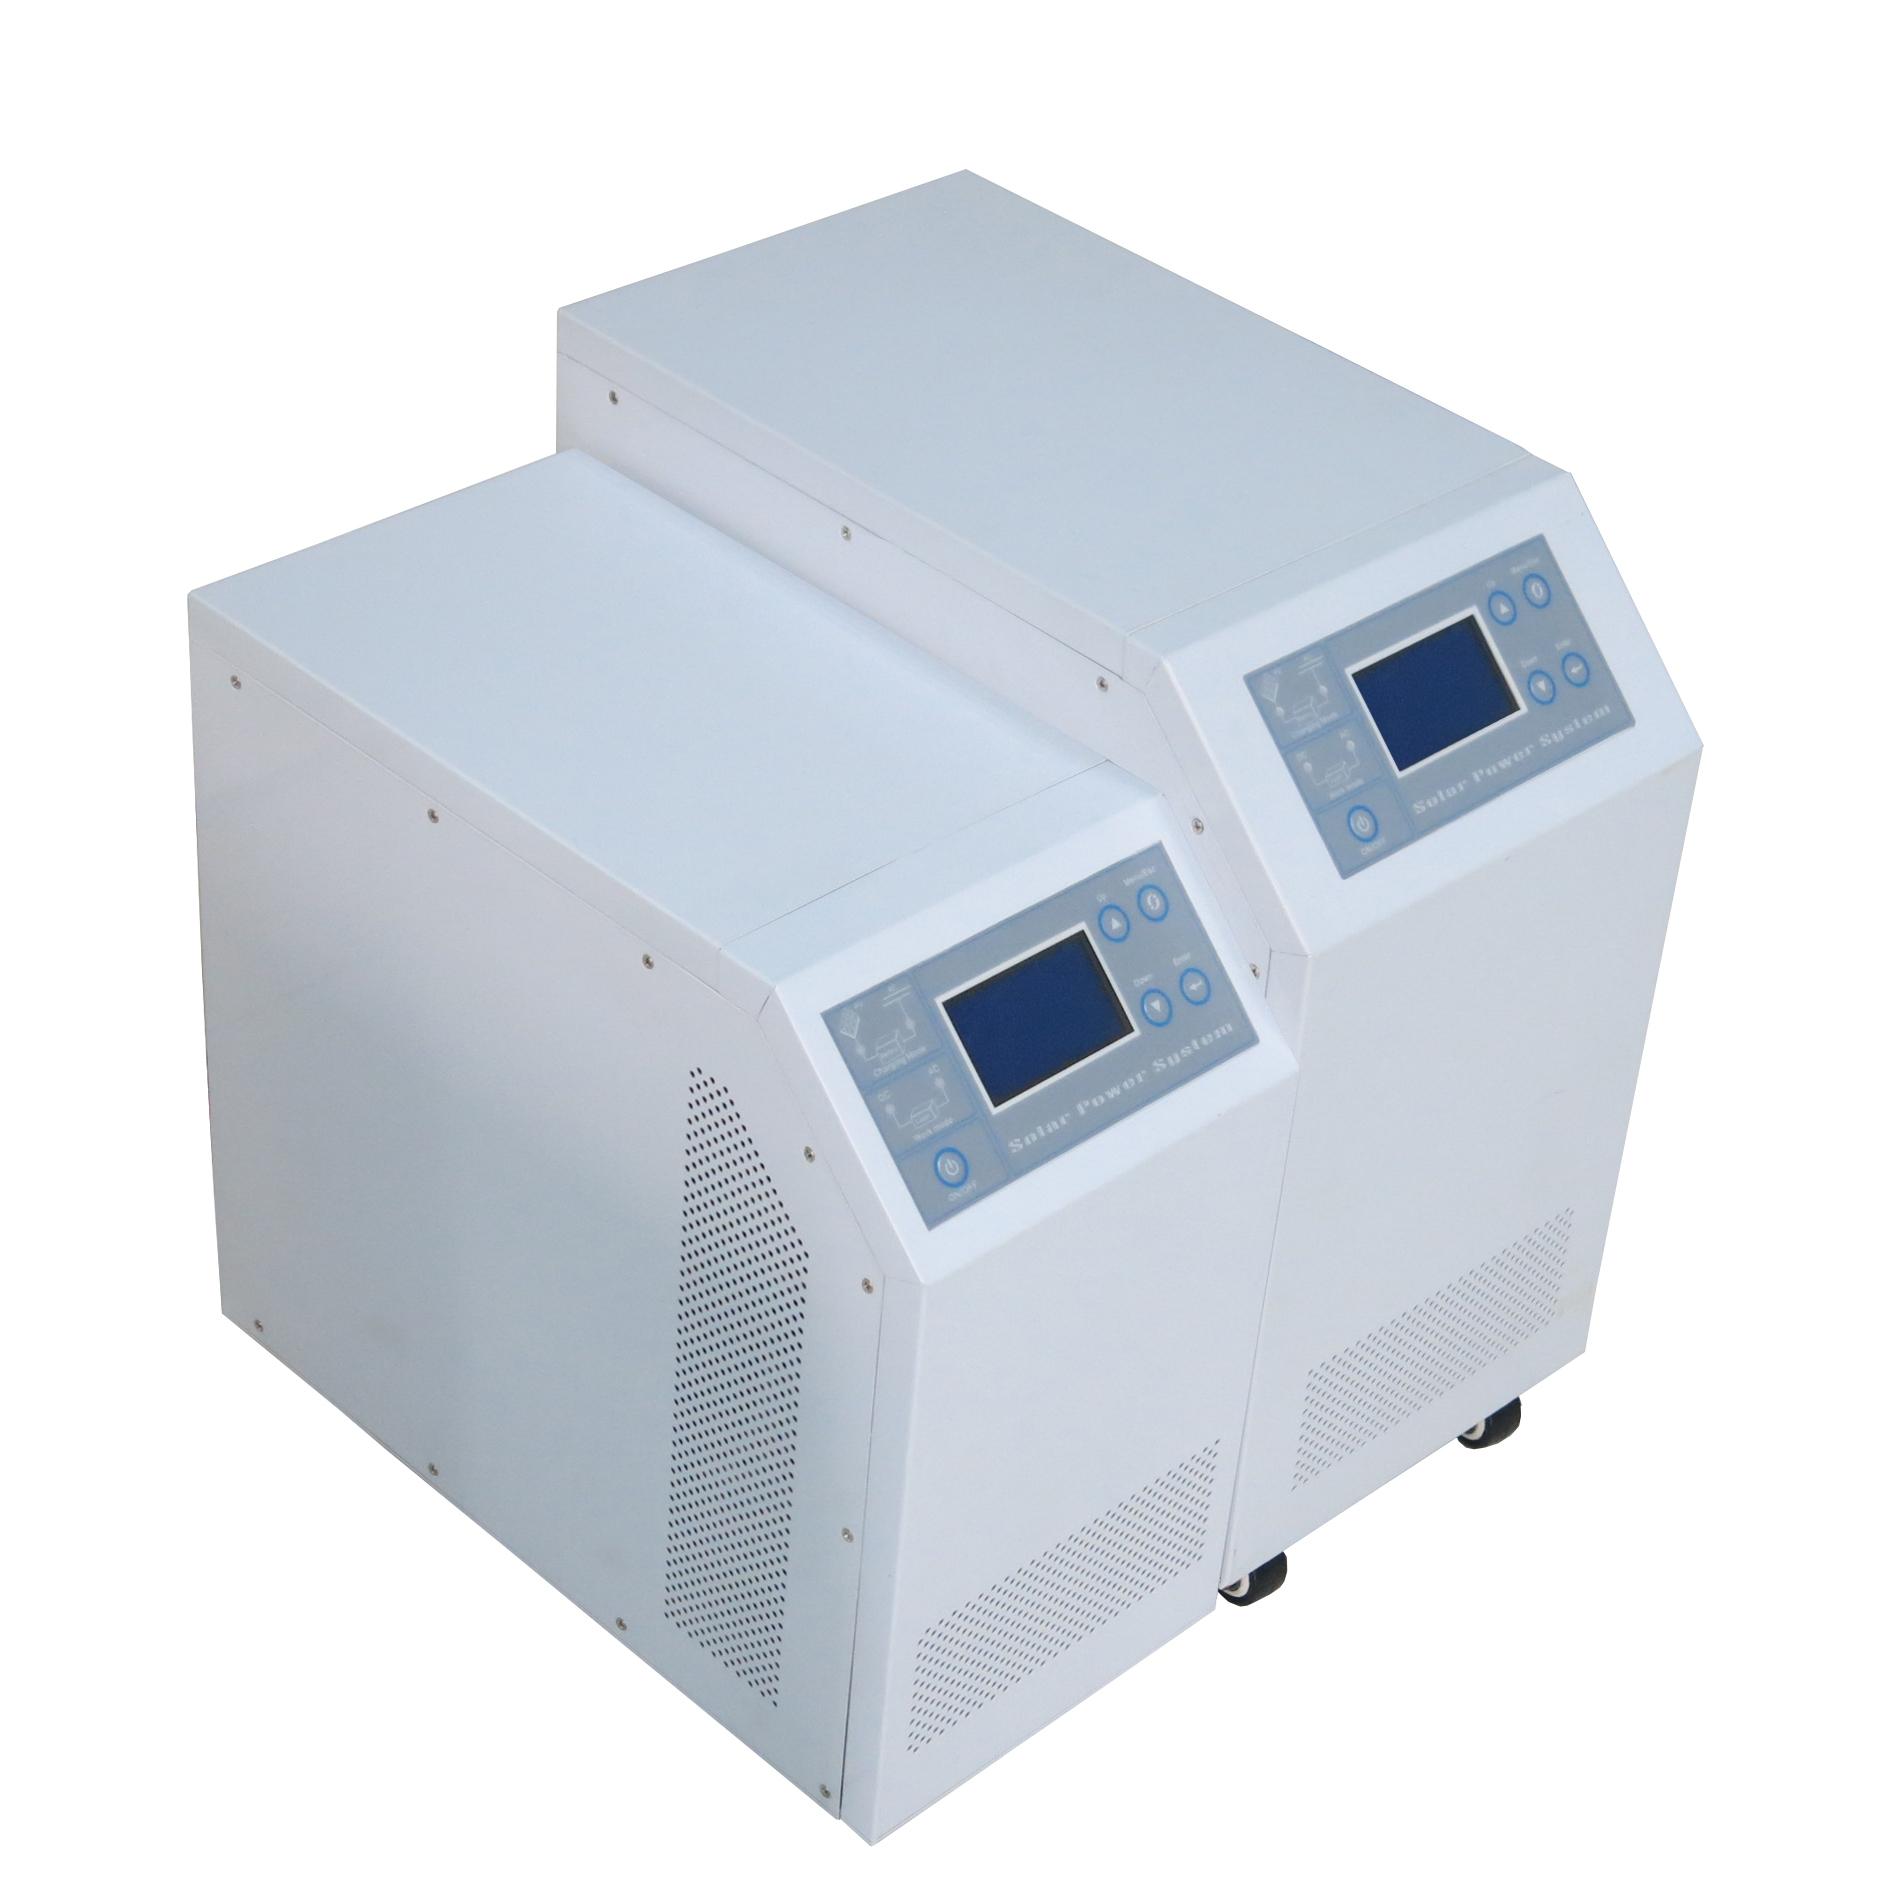 24v 1000w pure sine wave inverter with built in mppt solar charge dc 24v 1000w pure sine wave inverter with built in mppt solar charge controller pooptronica